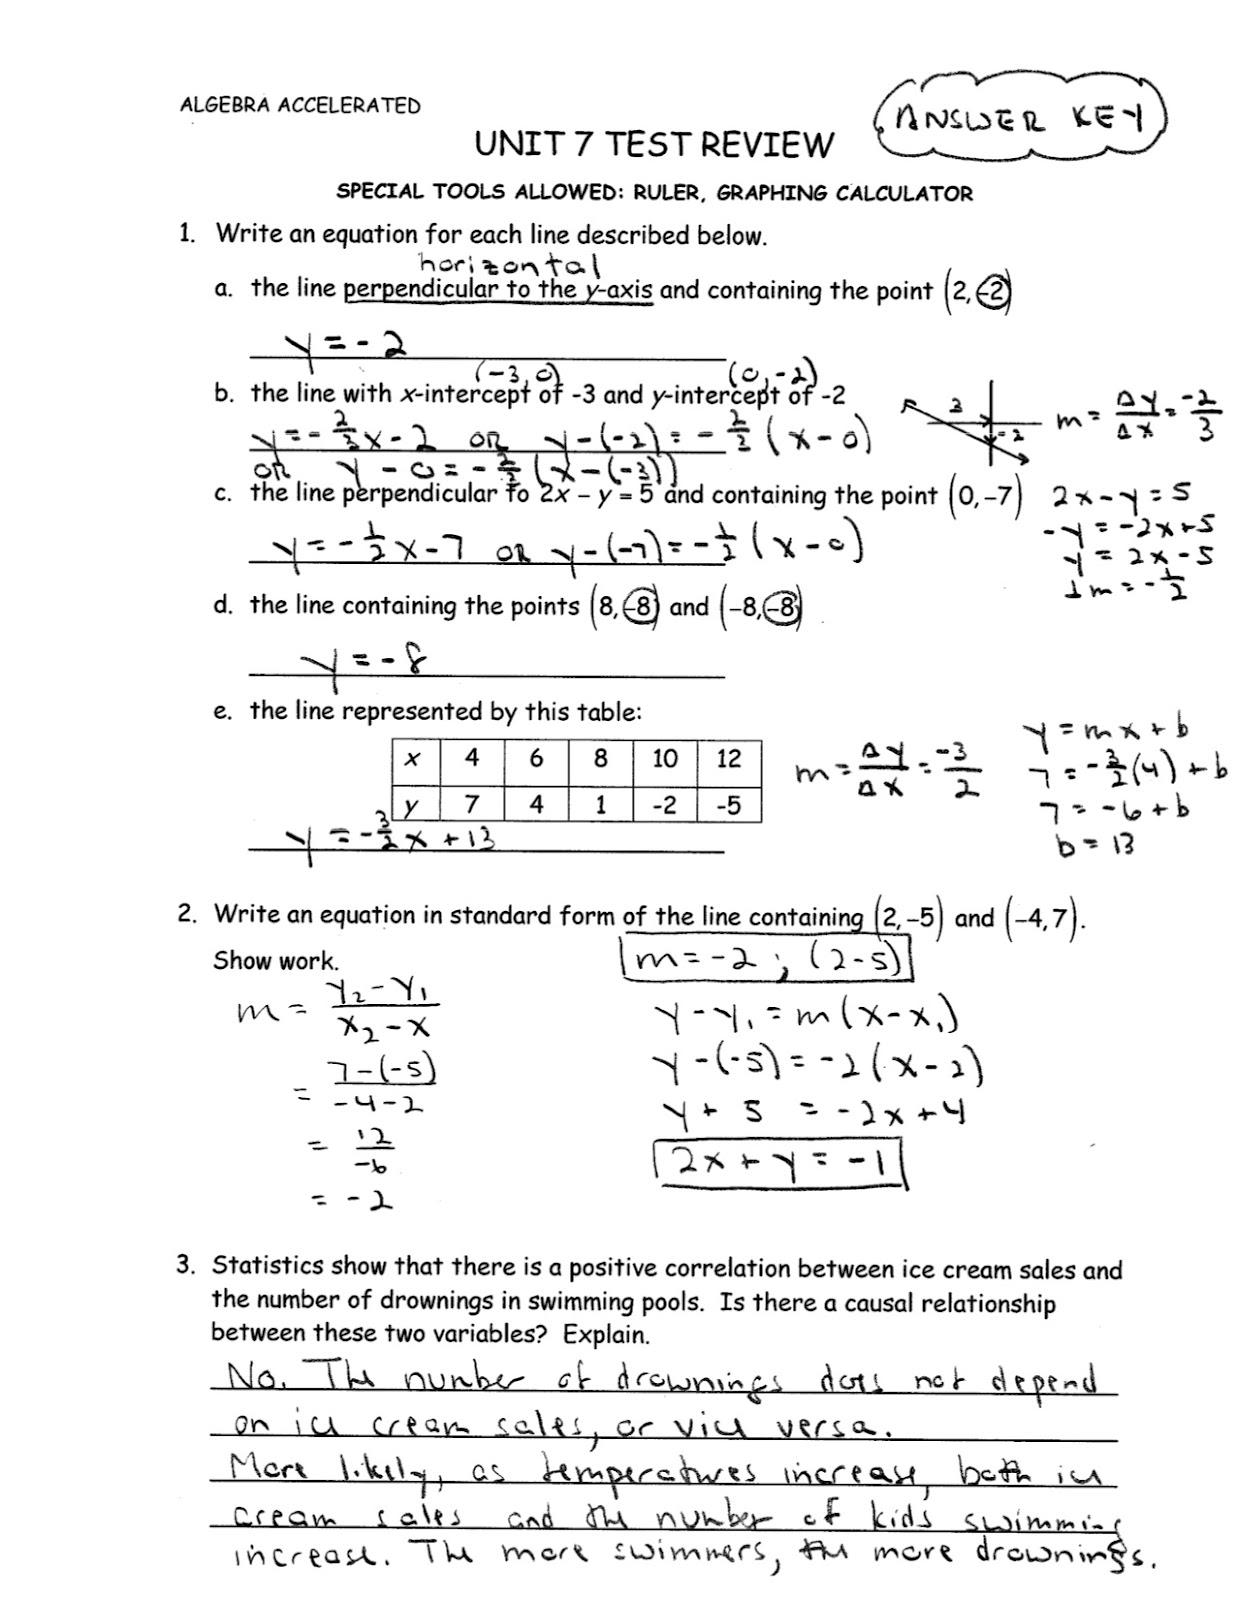 Iroquois Algebra Blog: Unit 7 Review Packet Answer Key